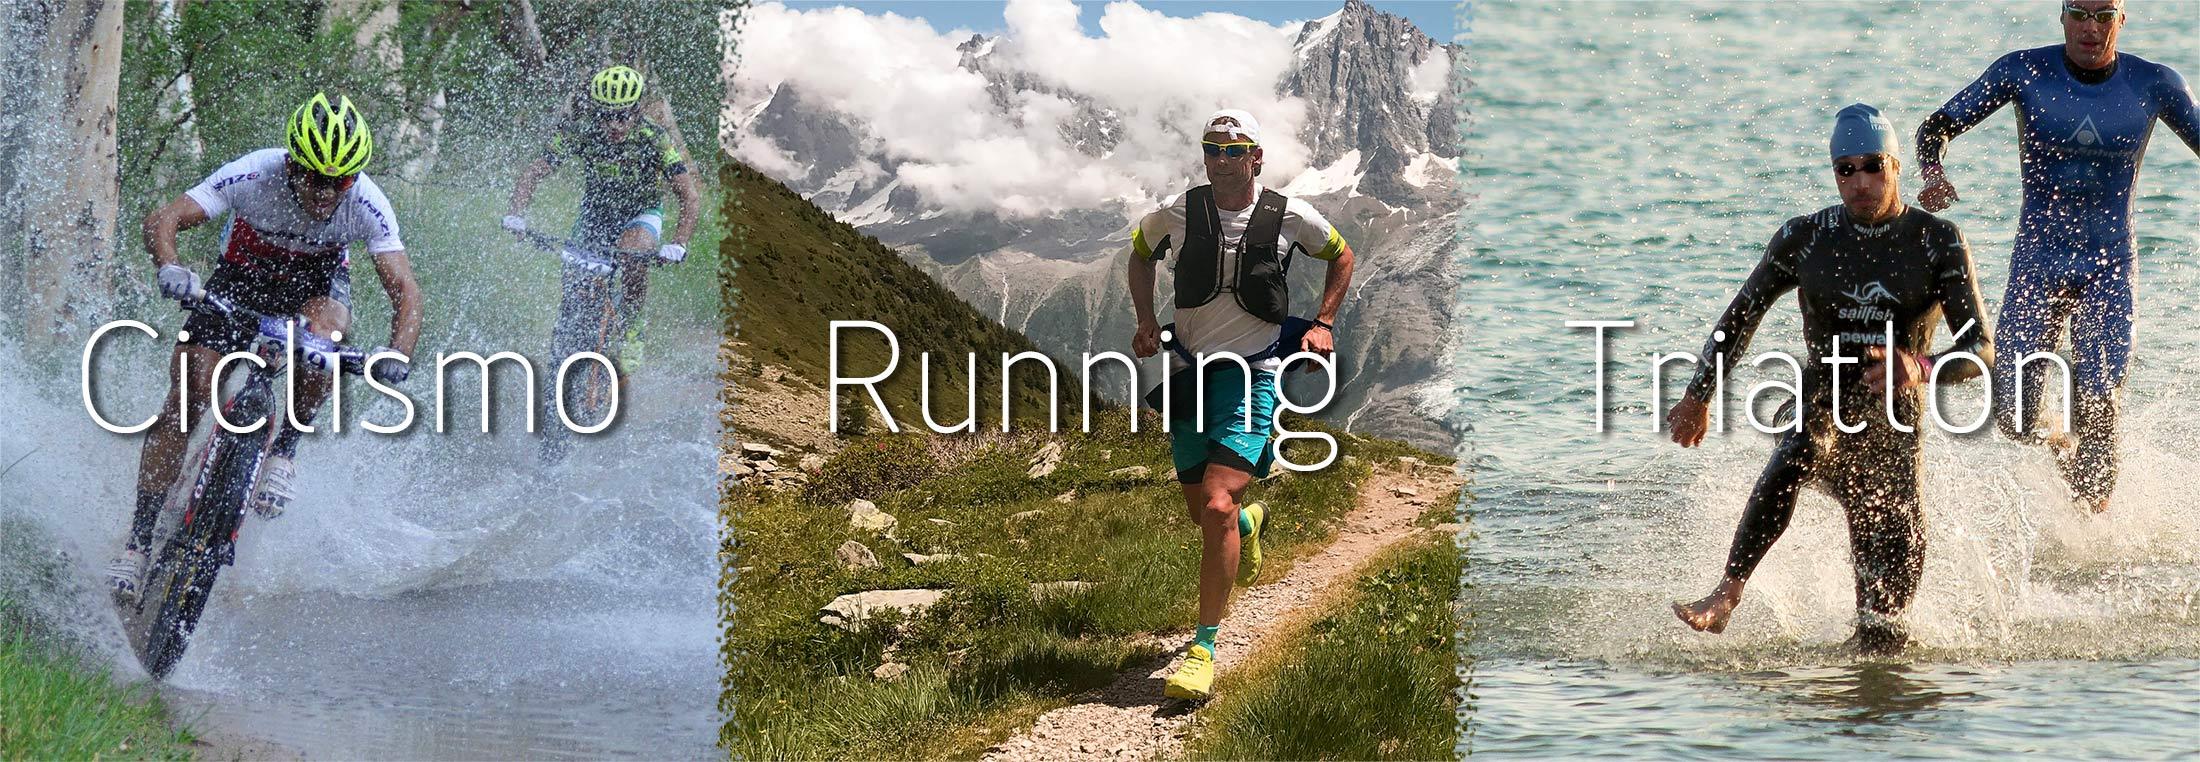 Ciclismo, running, triatlón